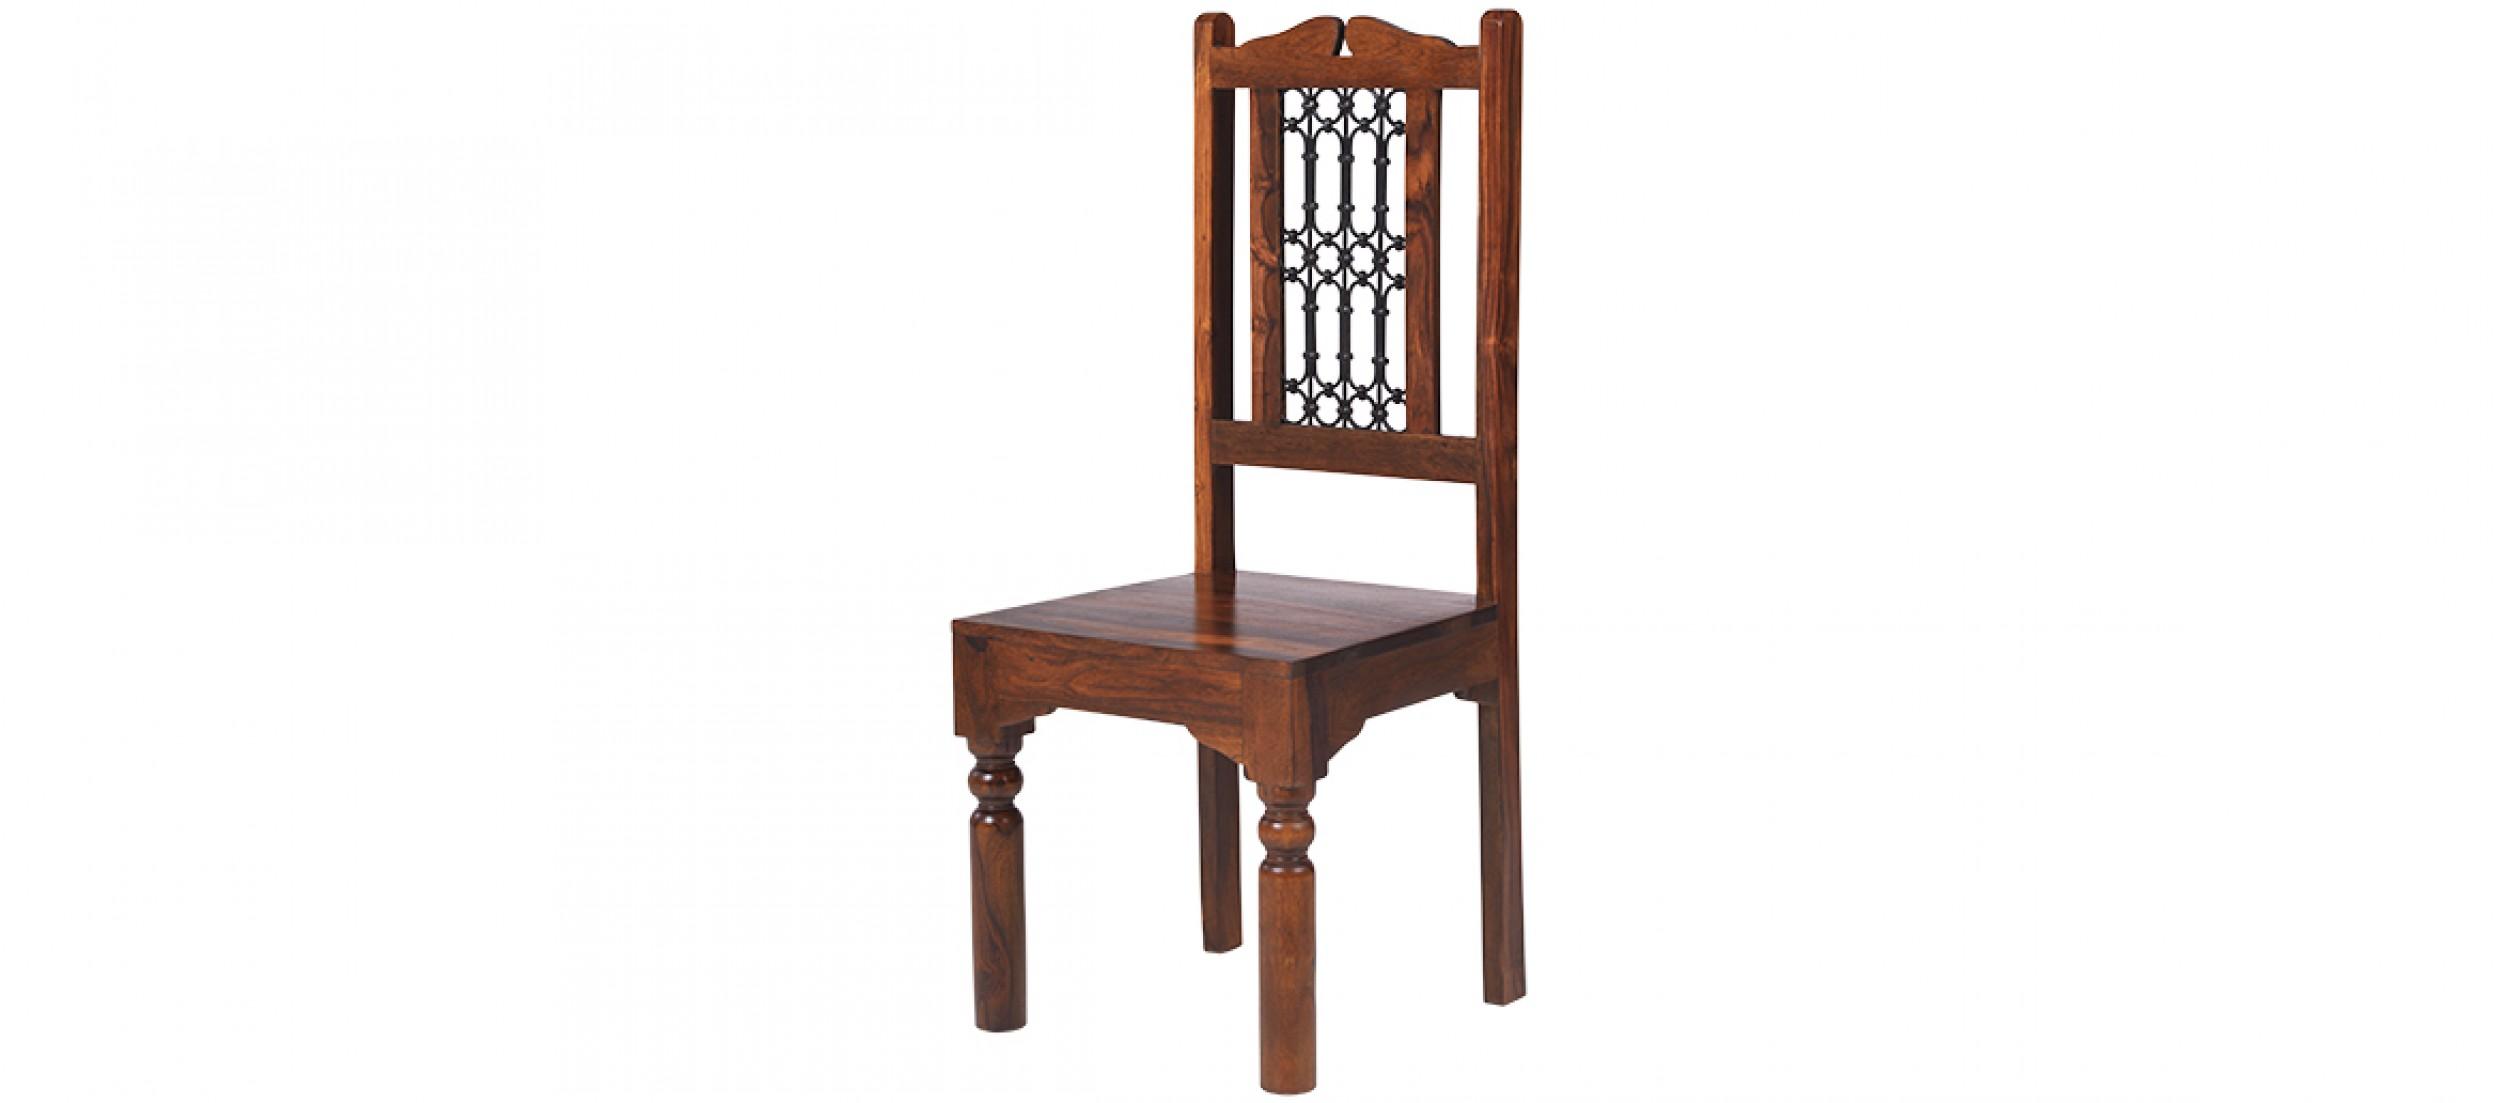 jali sheesham high back ironwork dining chairs  pair  quercus living - jali sheesham high back ironwork dining chairs  pair